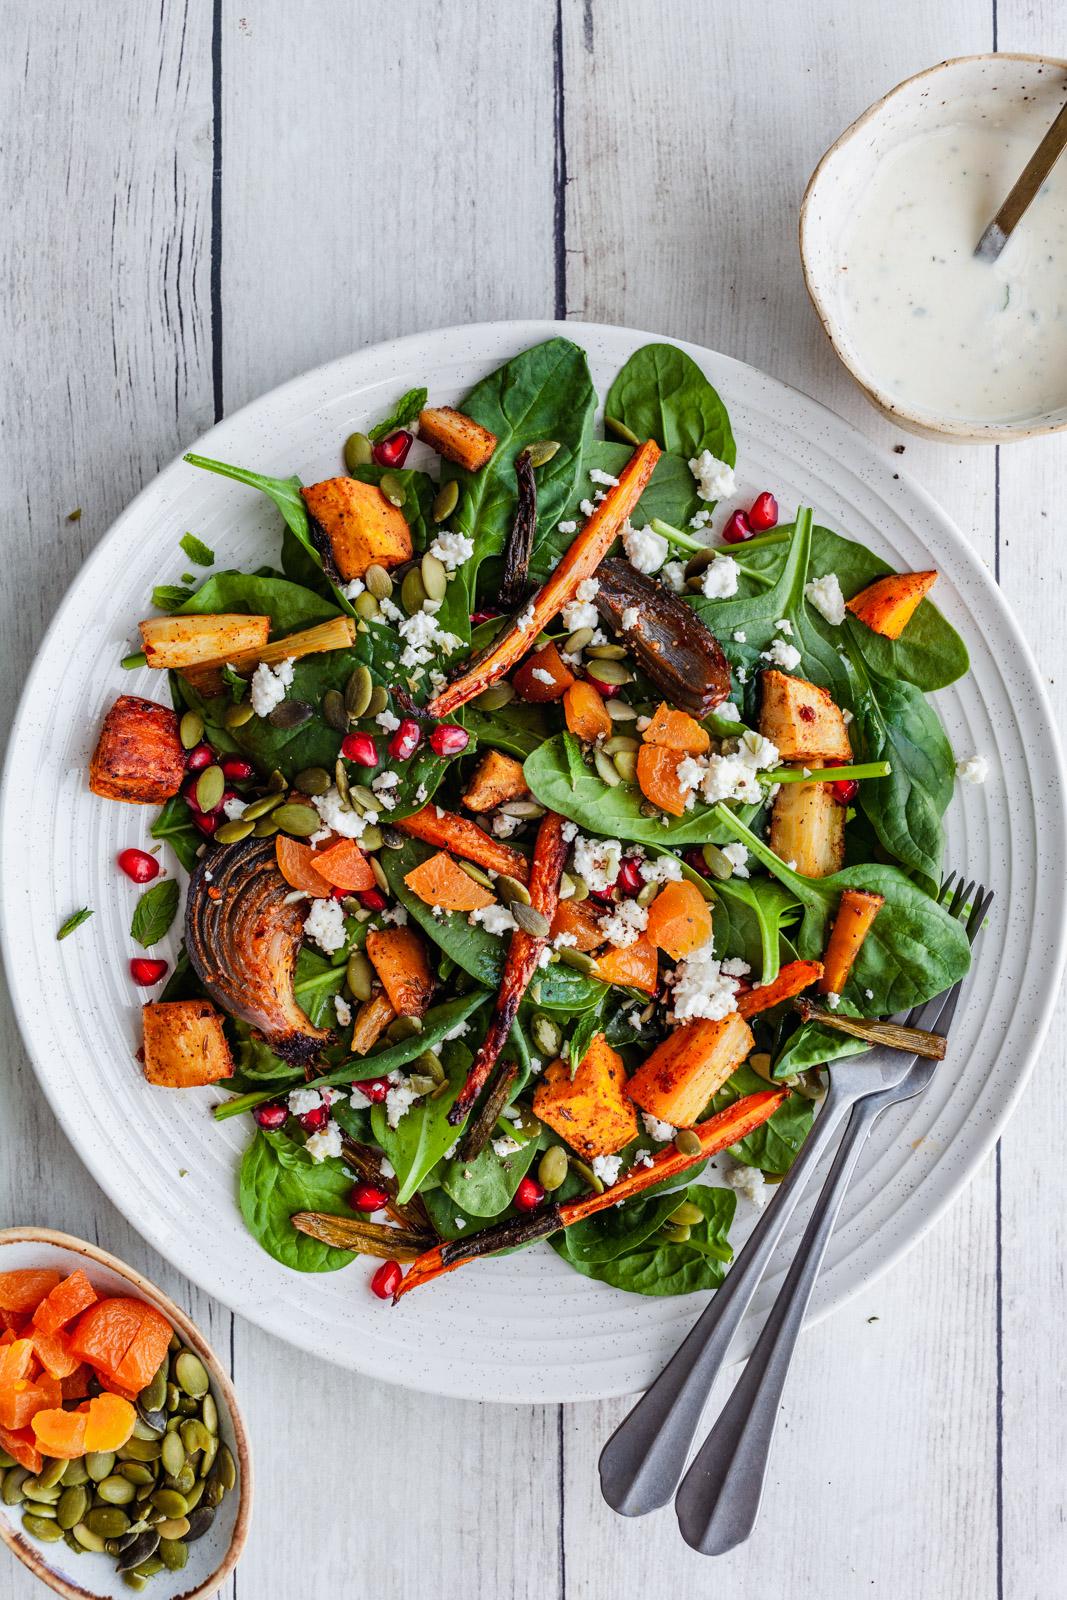 African spicy vegetable salad